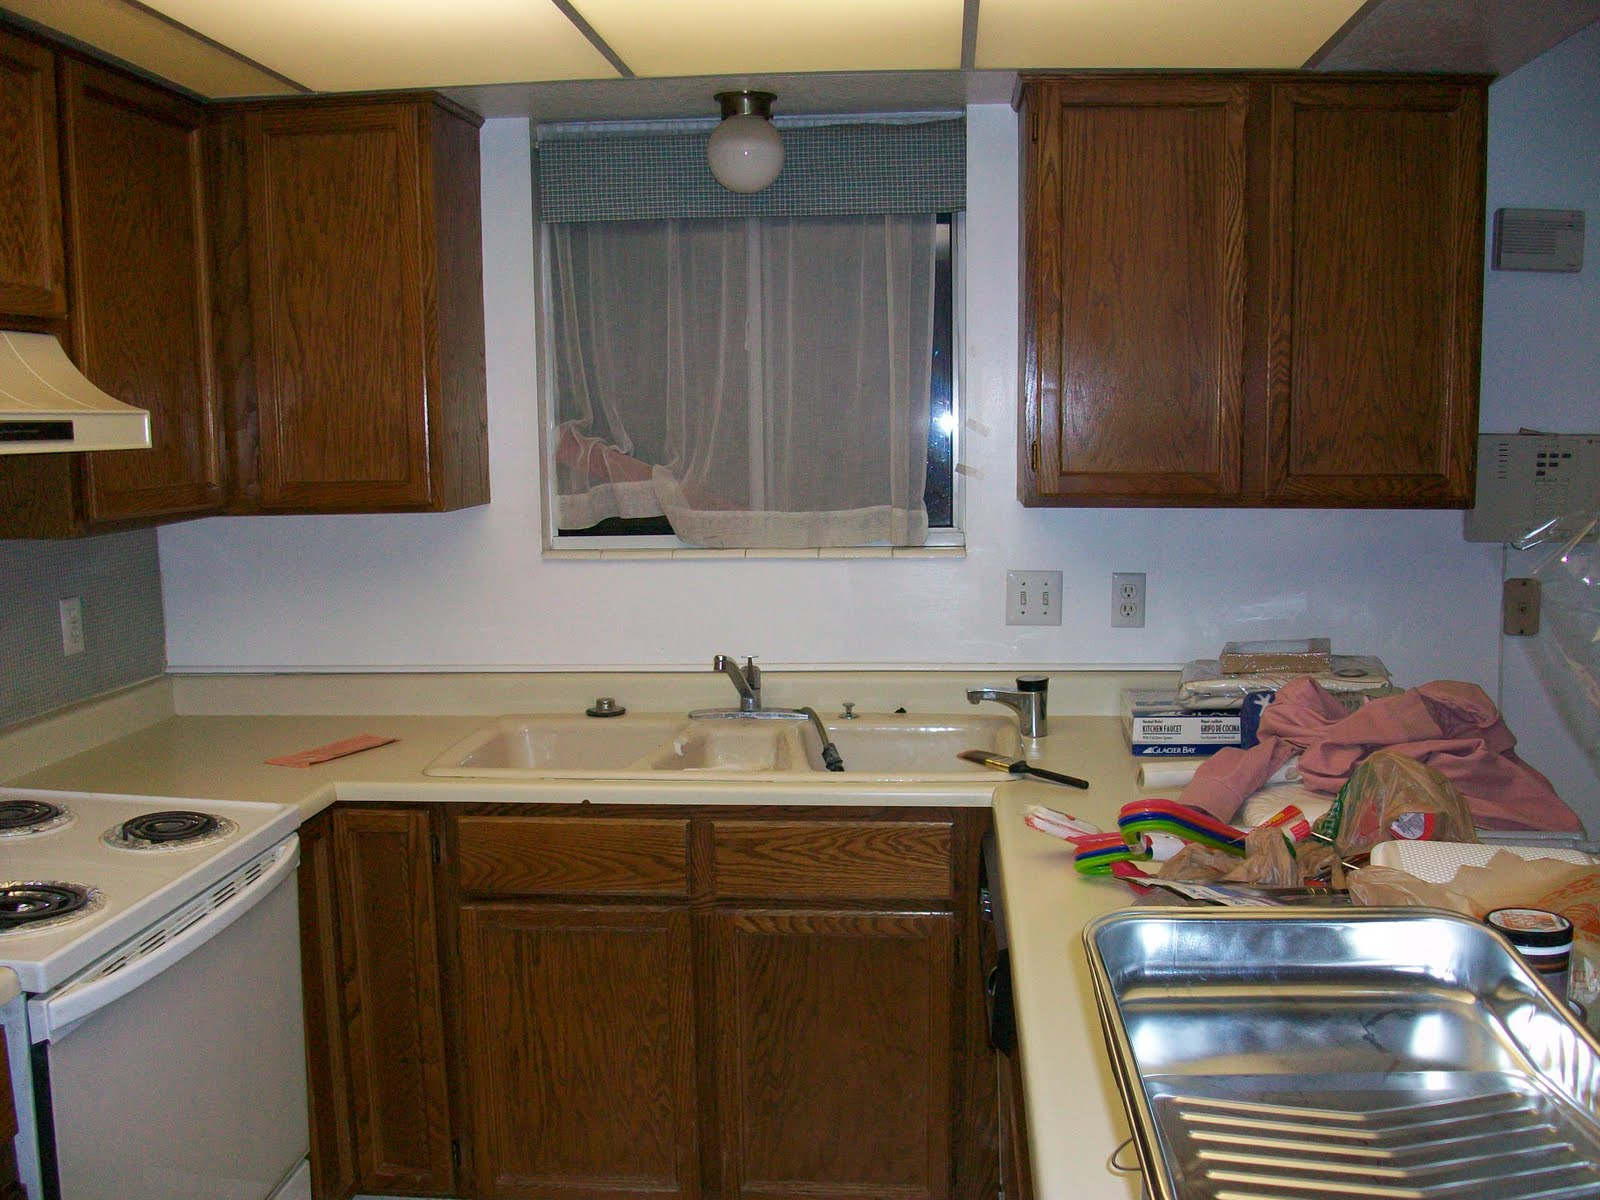 Remodelaholic Kitchen Remodel On A Budget - Kitchen remodel on a budget pictures